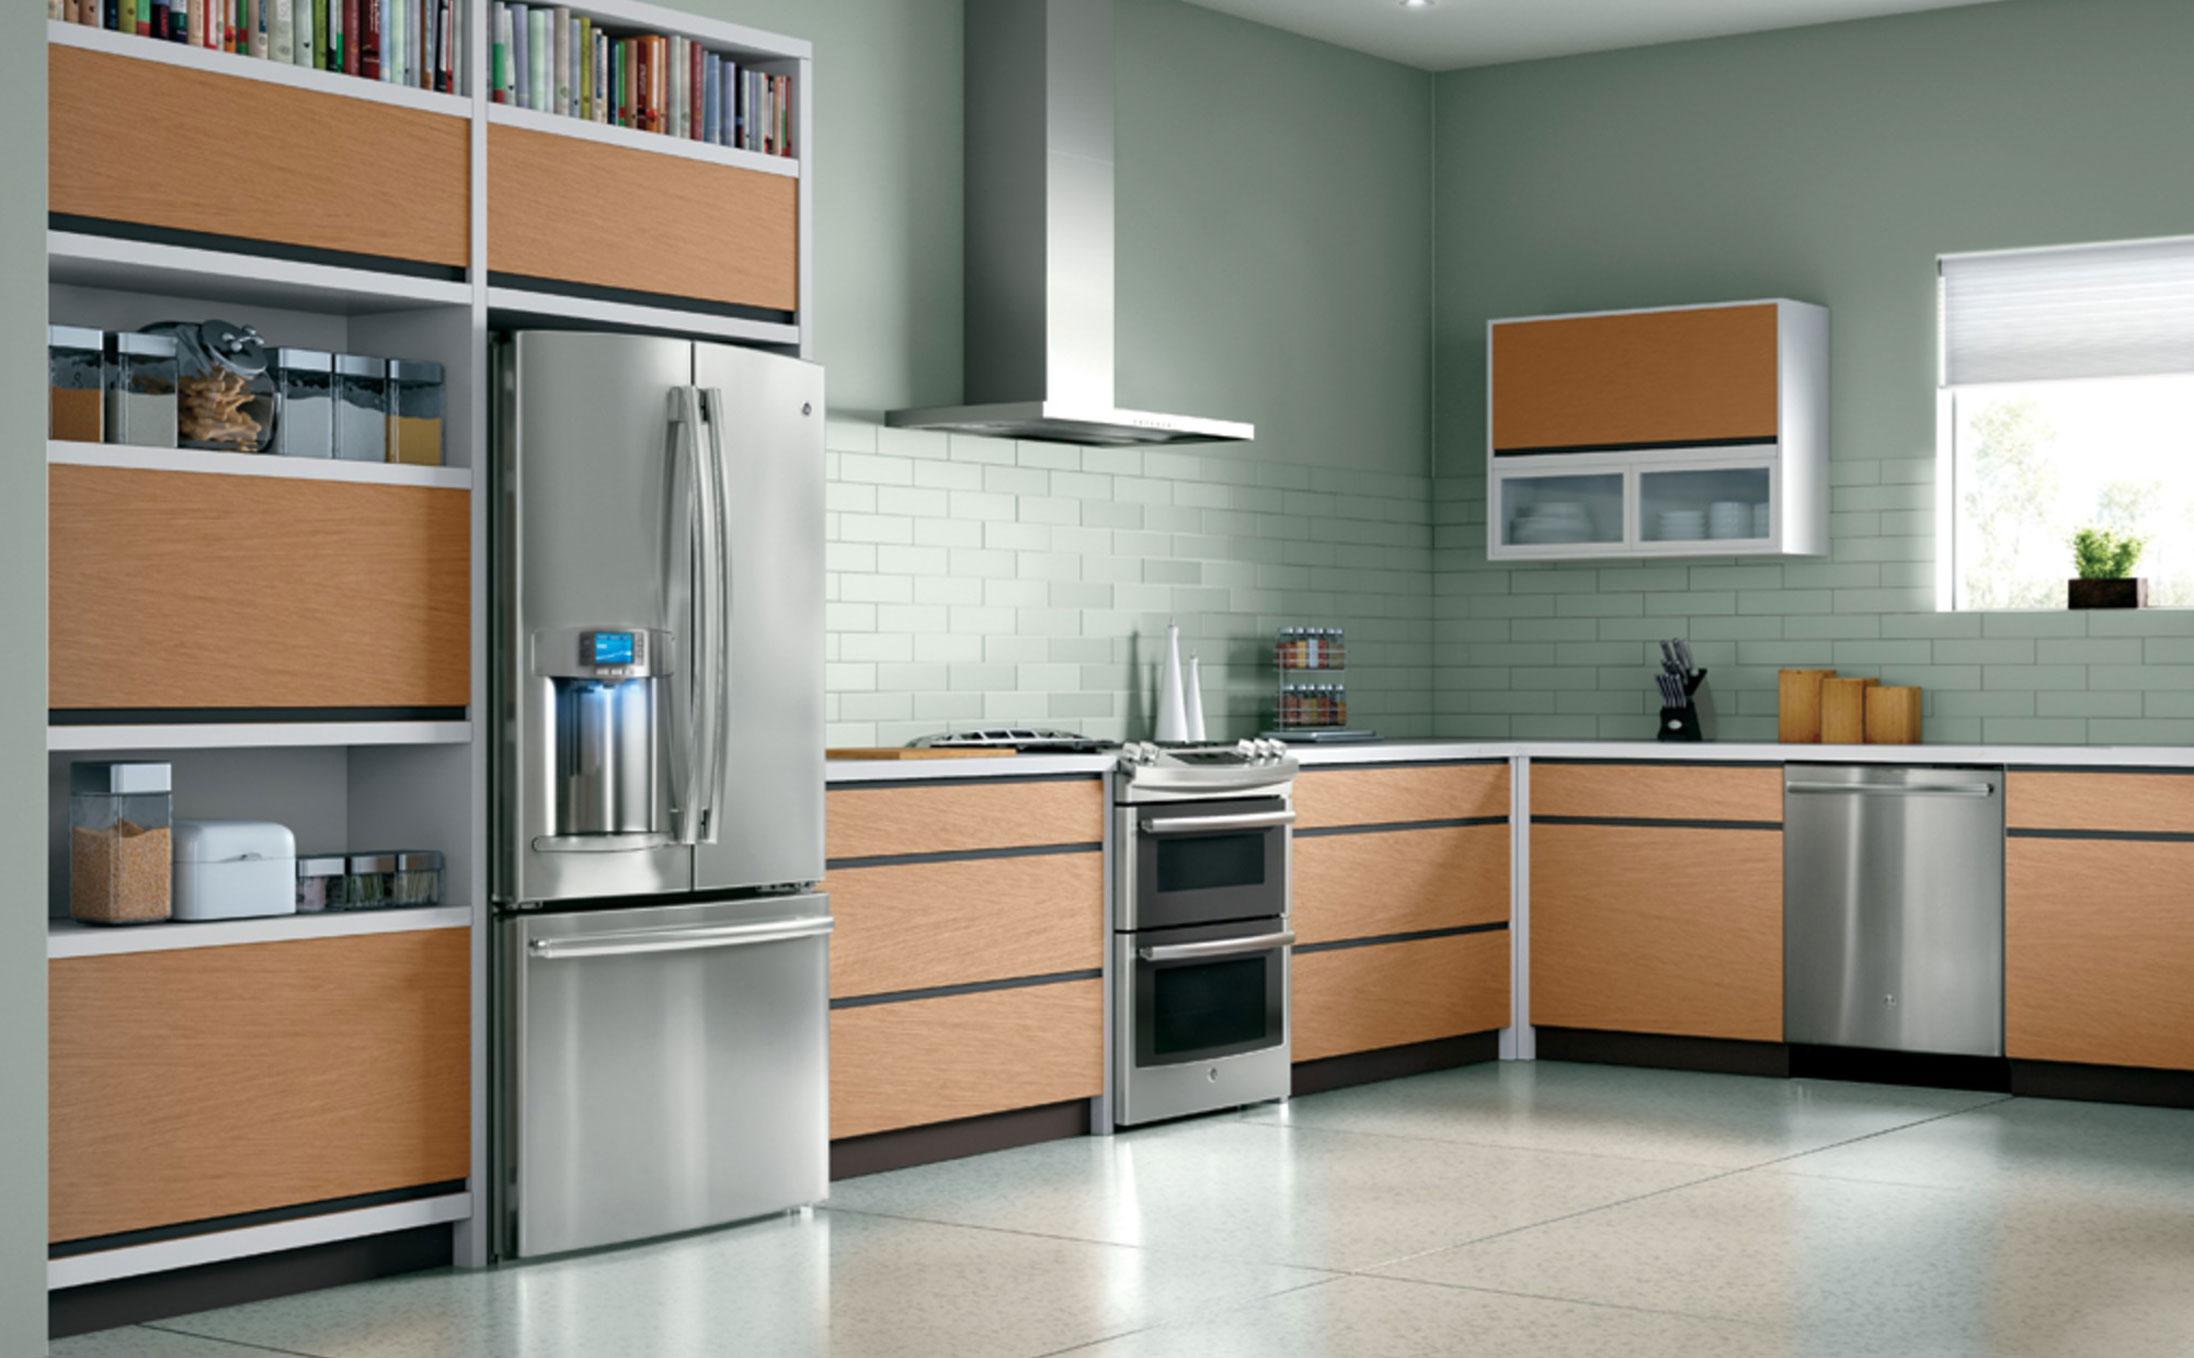 Ge Profile Appliances Arizona Wholesale Supply